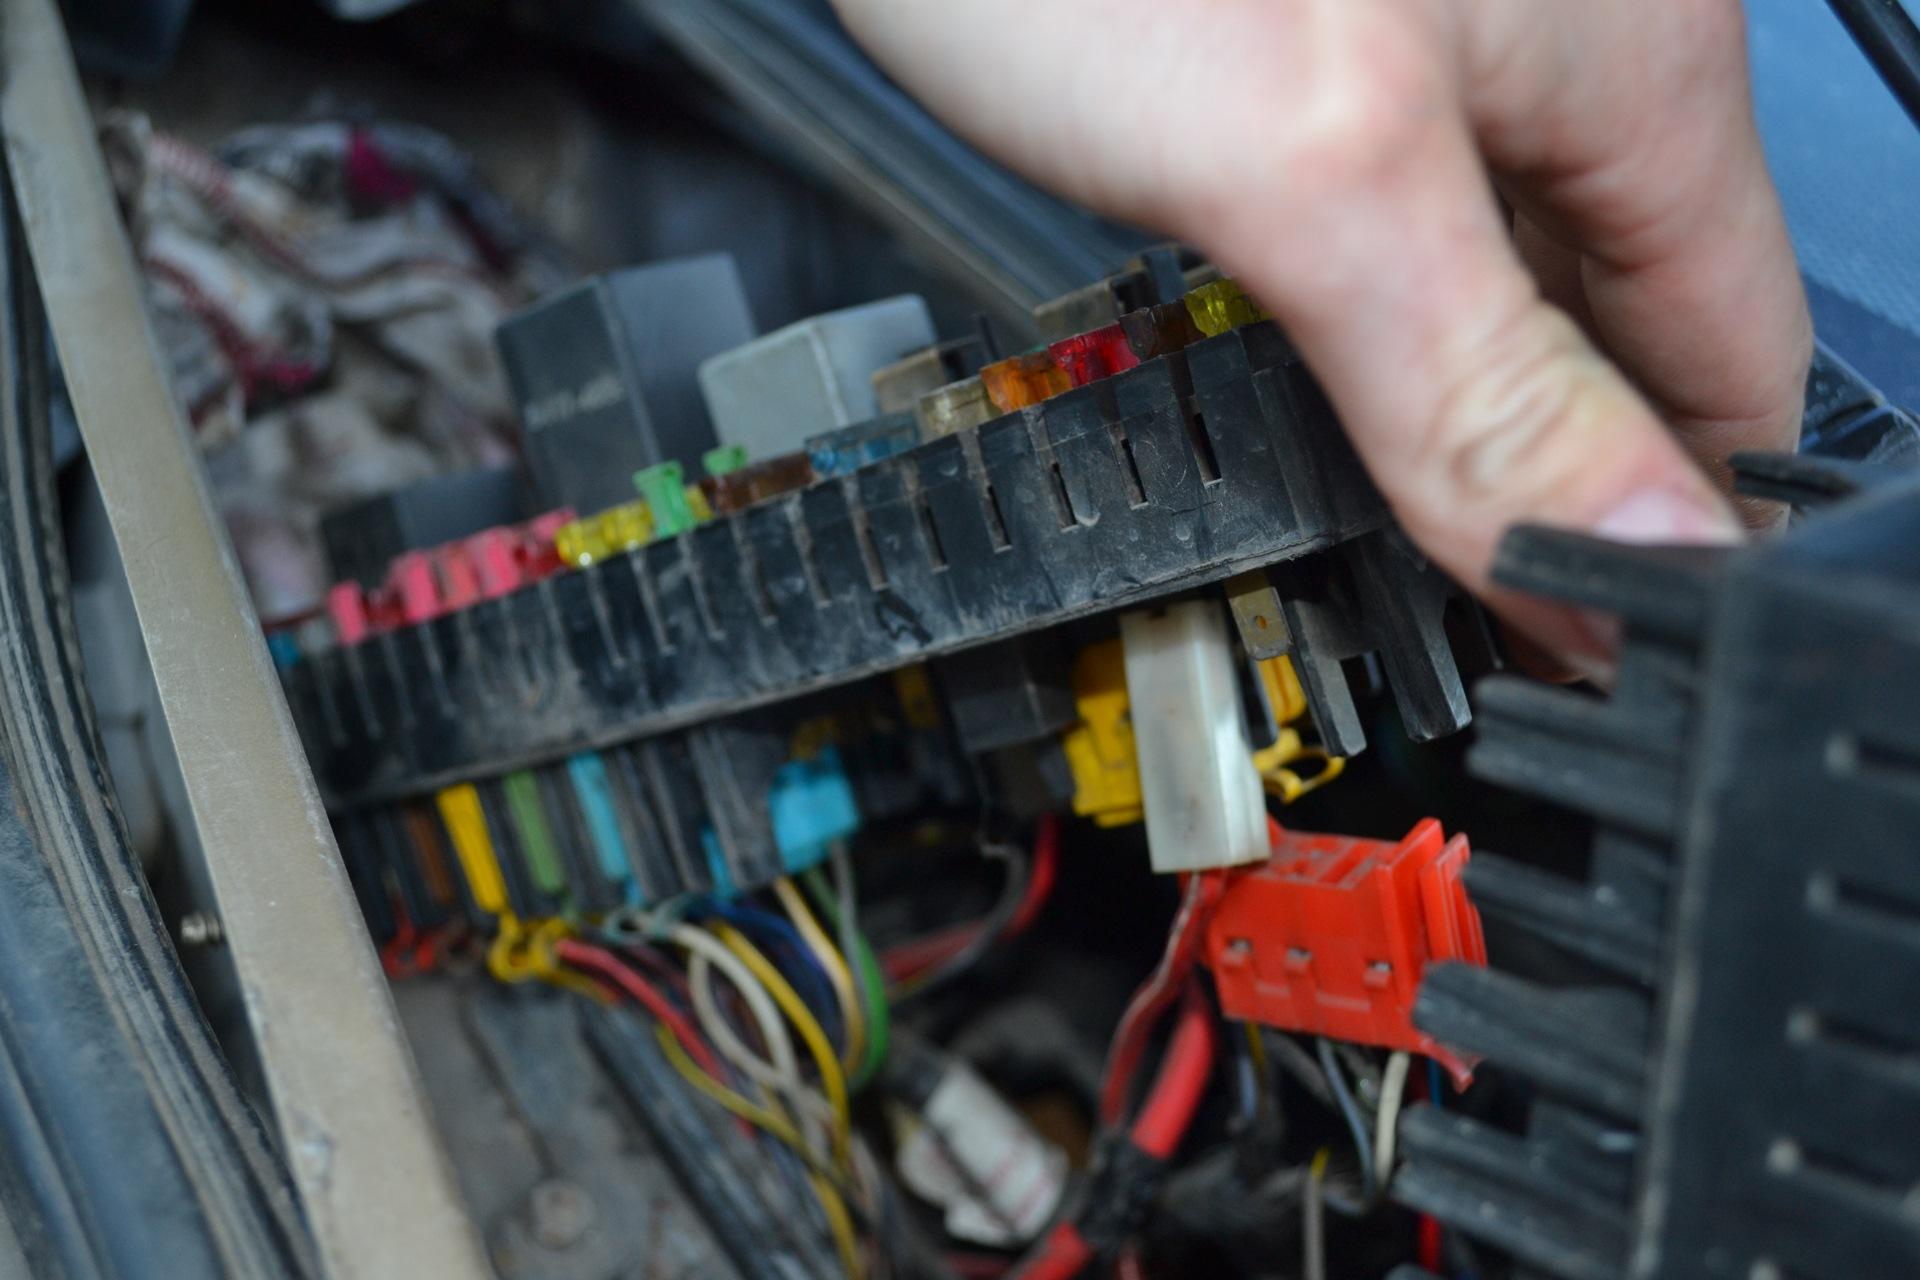 audi 80 fuse box 37ffd27 audi 80 fuse box location wiring resources  37ffd27 audi 80 fuse box location